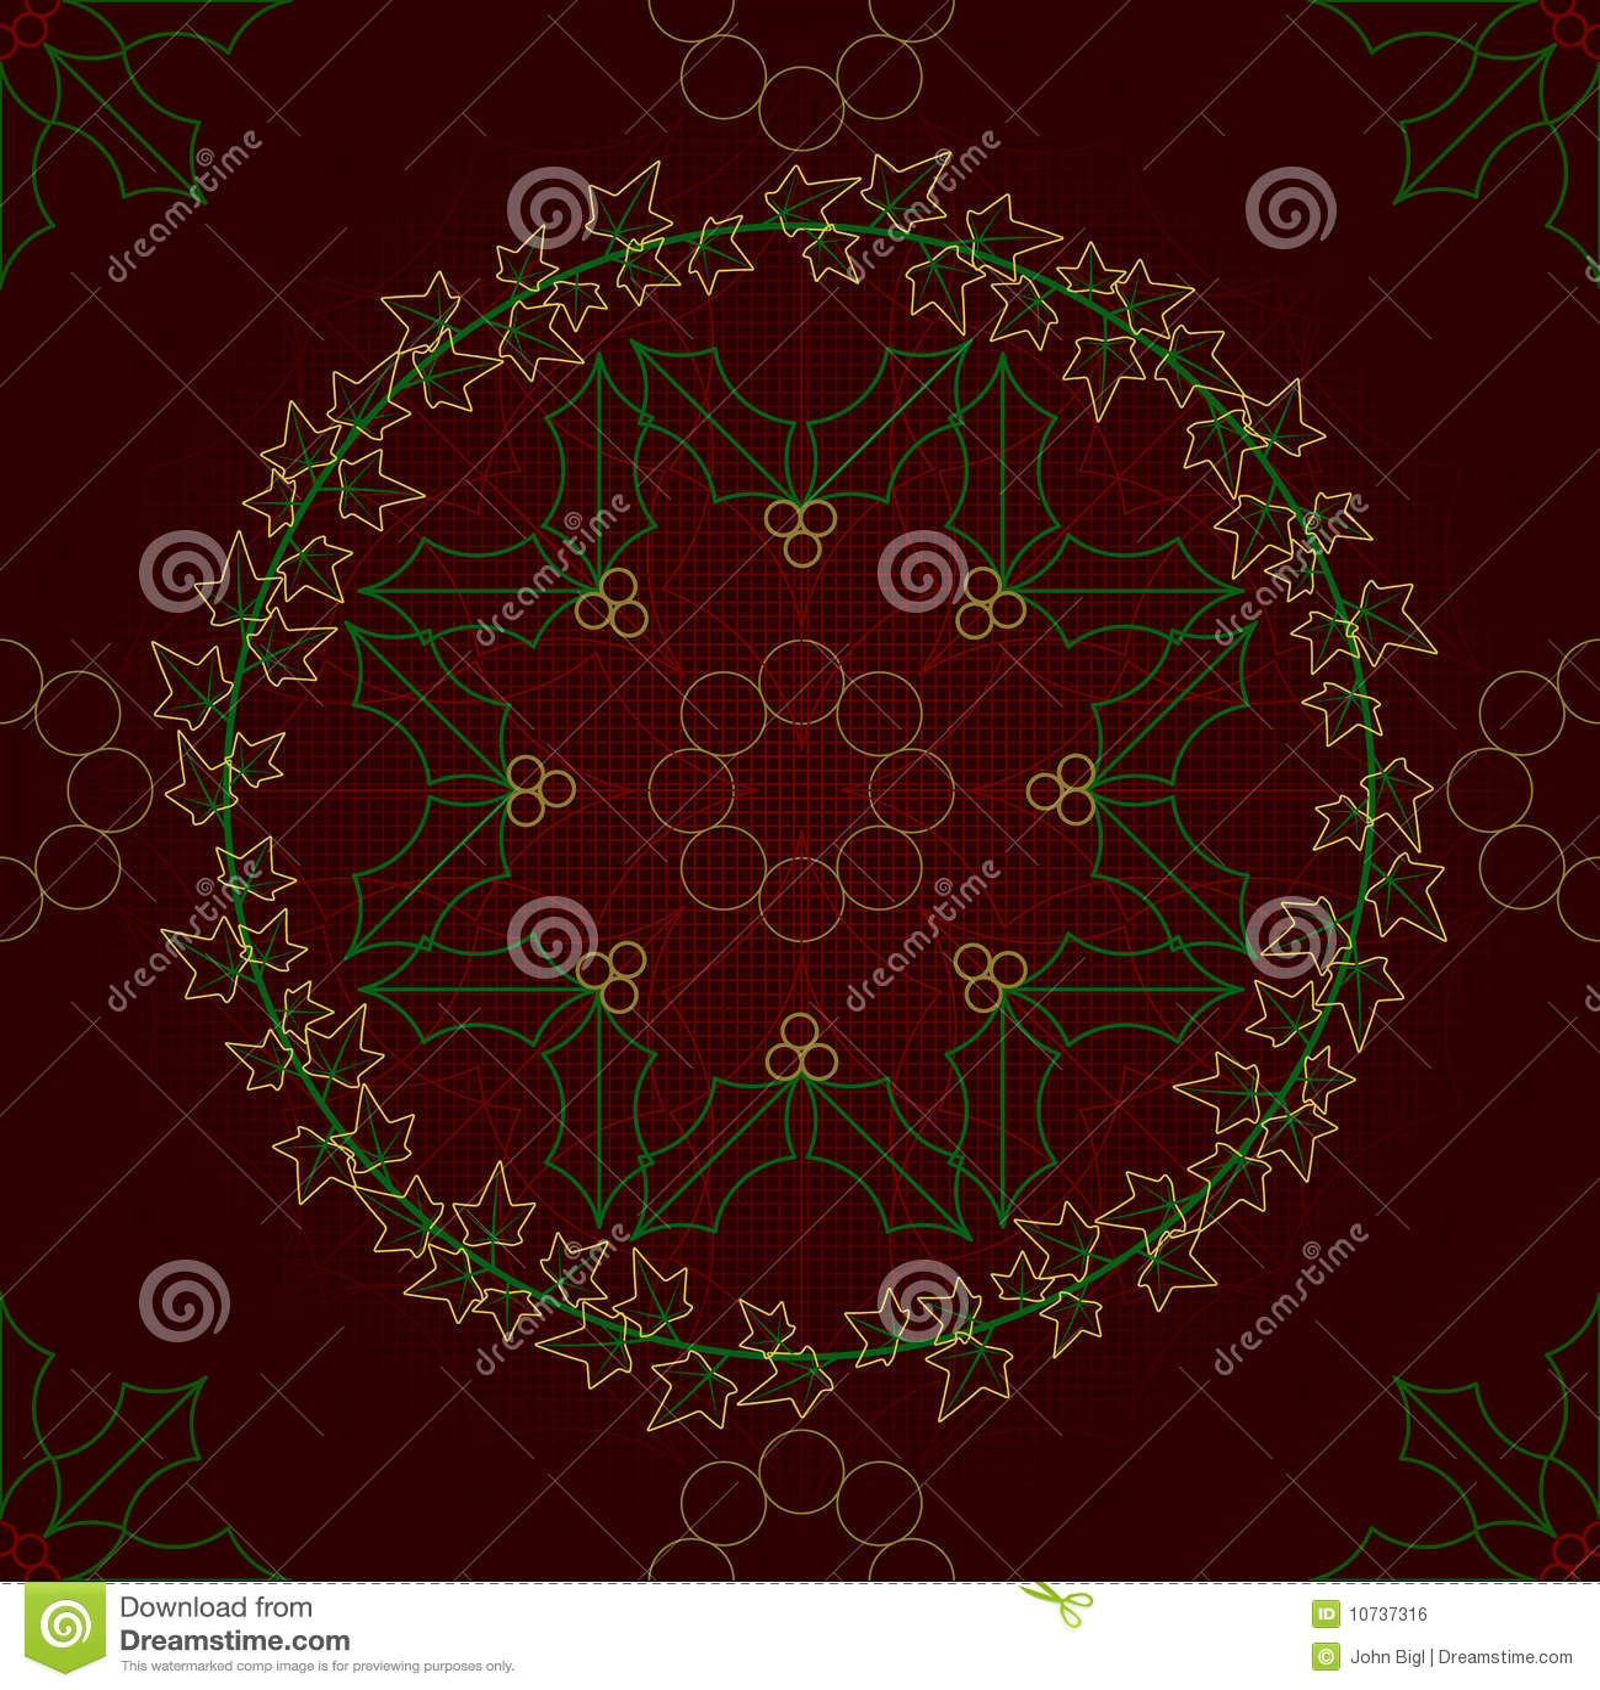 lace background tile - photo #45